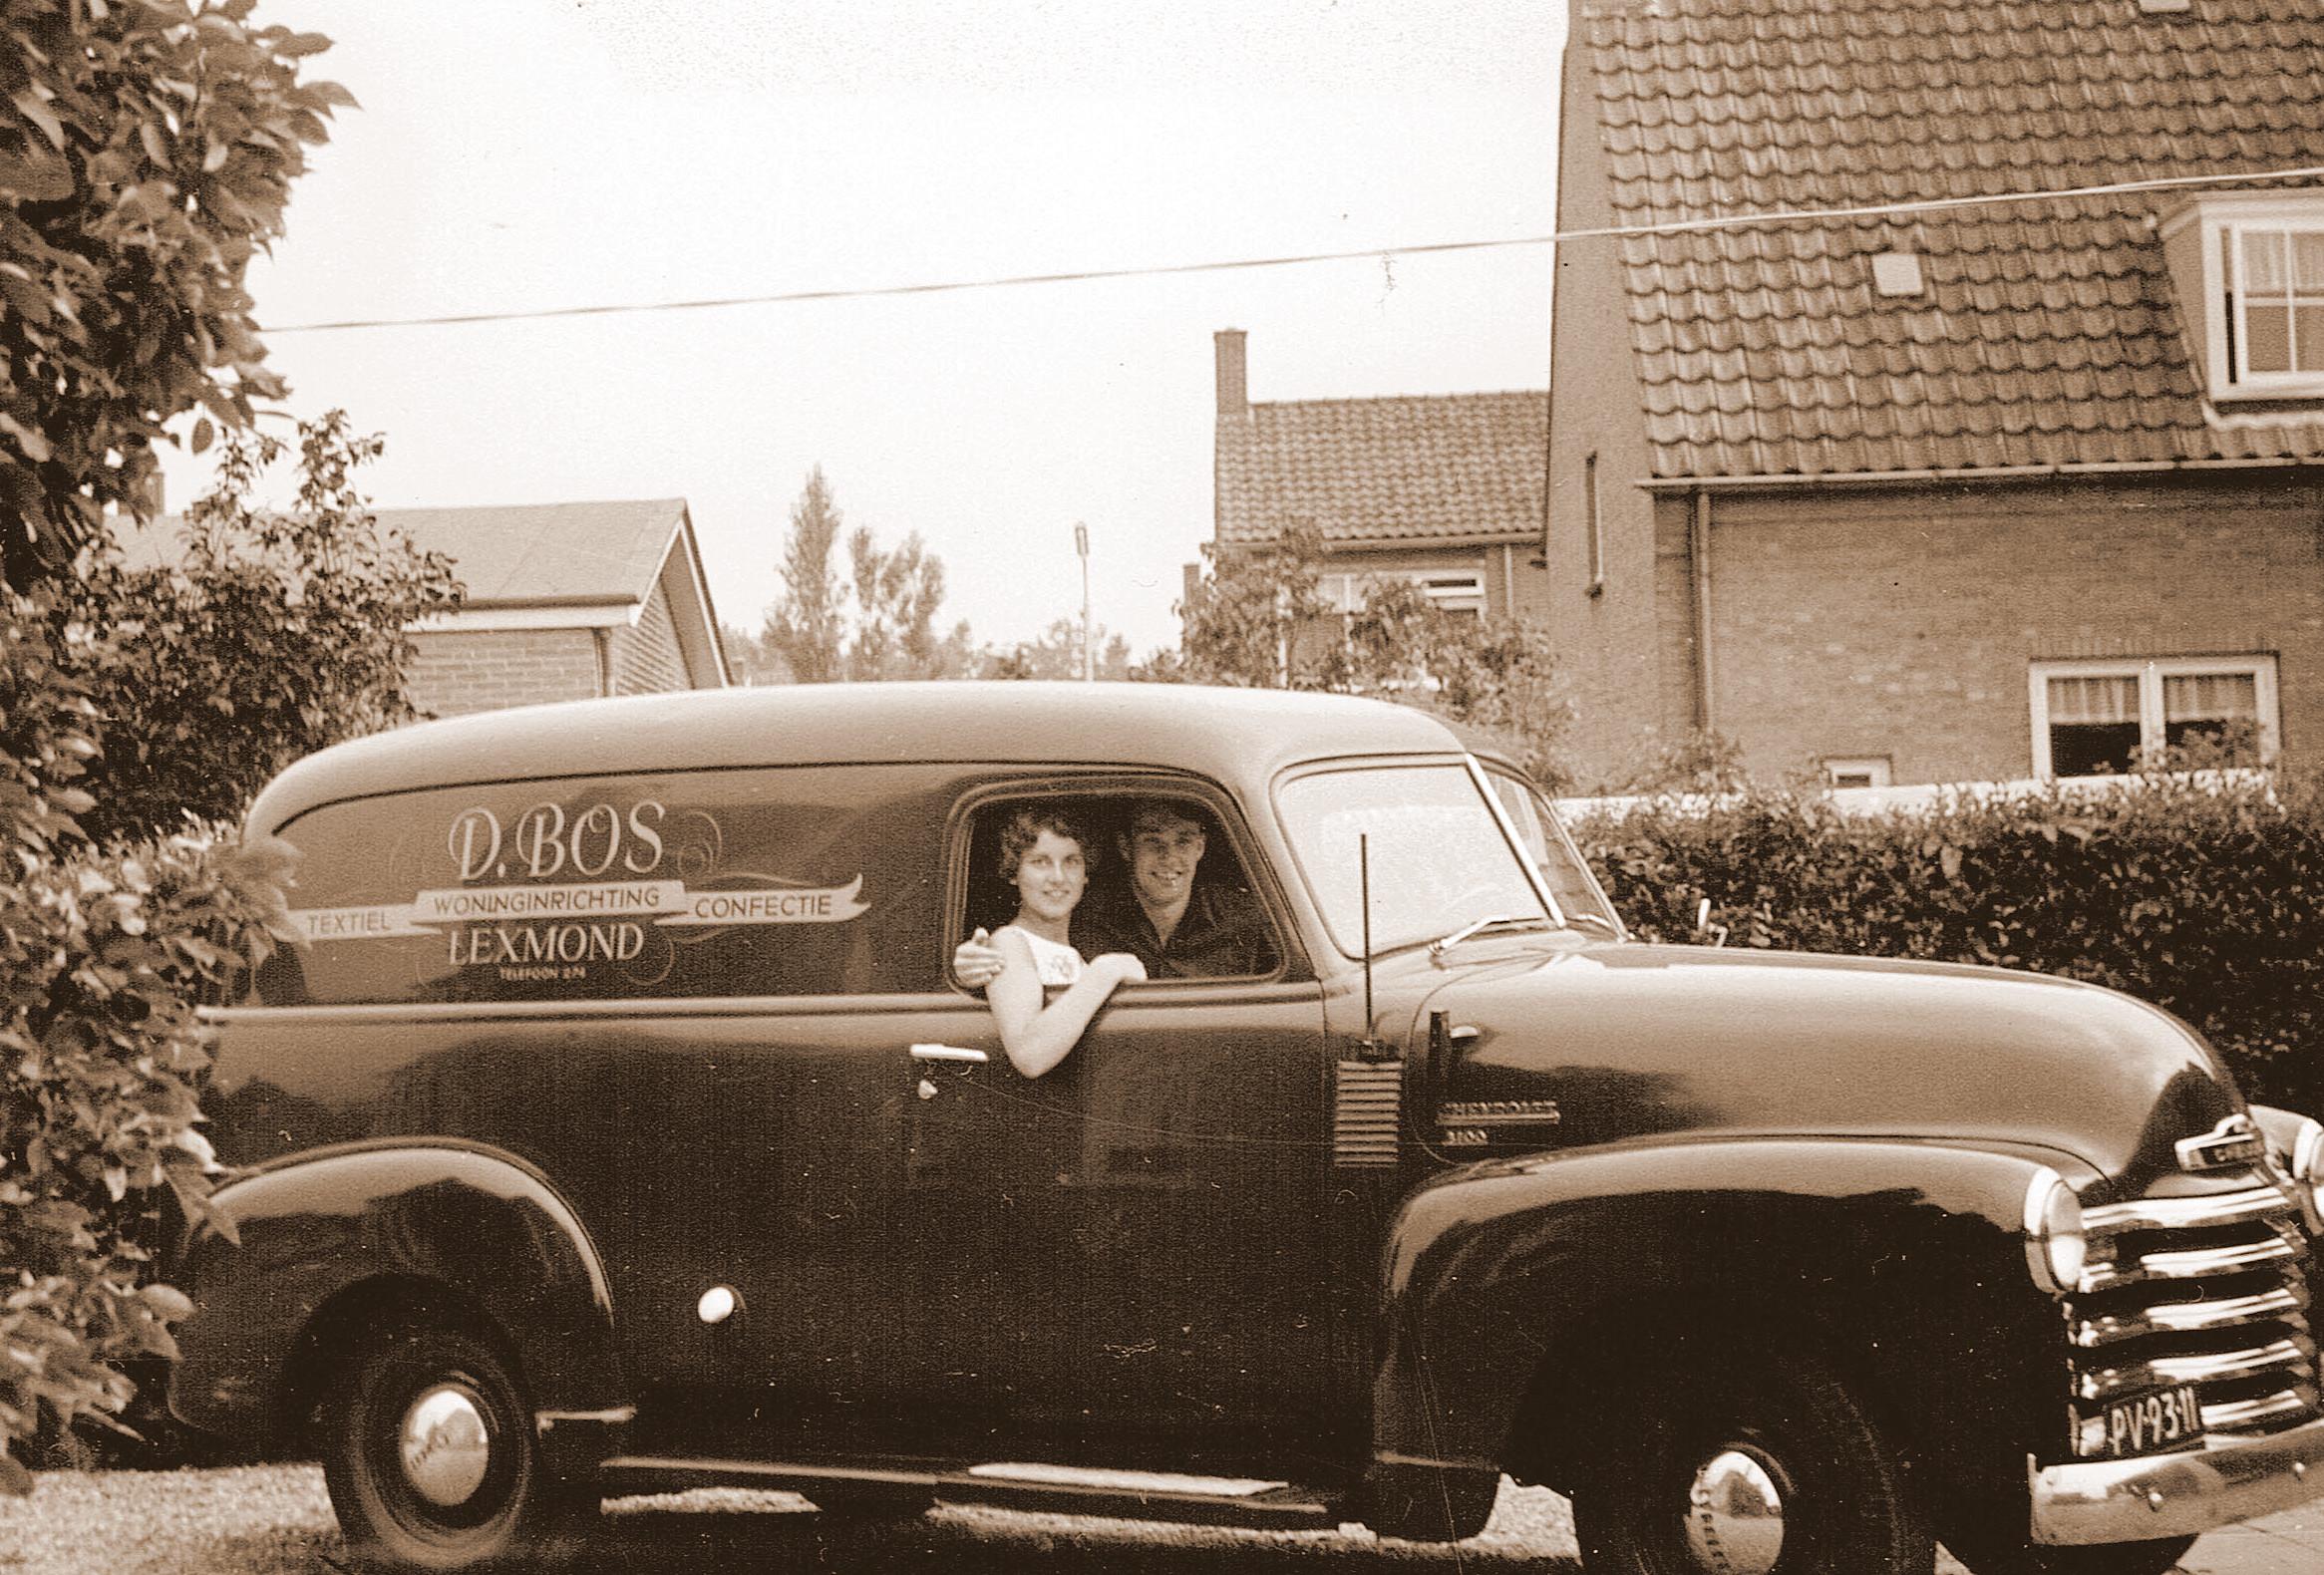 Chevrolet-Goof-en-Greet-Bos-voelen-zich-prins-en-prinses-in-deze-fraaie-auto-van-Dirk-Bos--